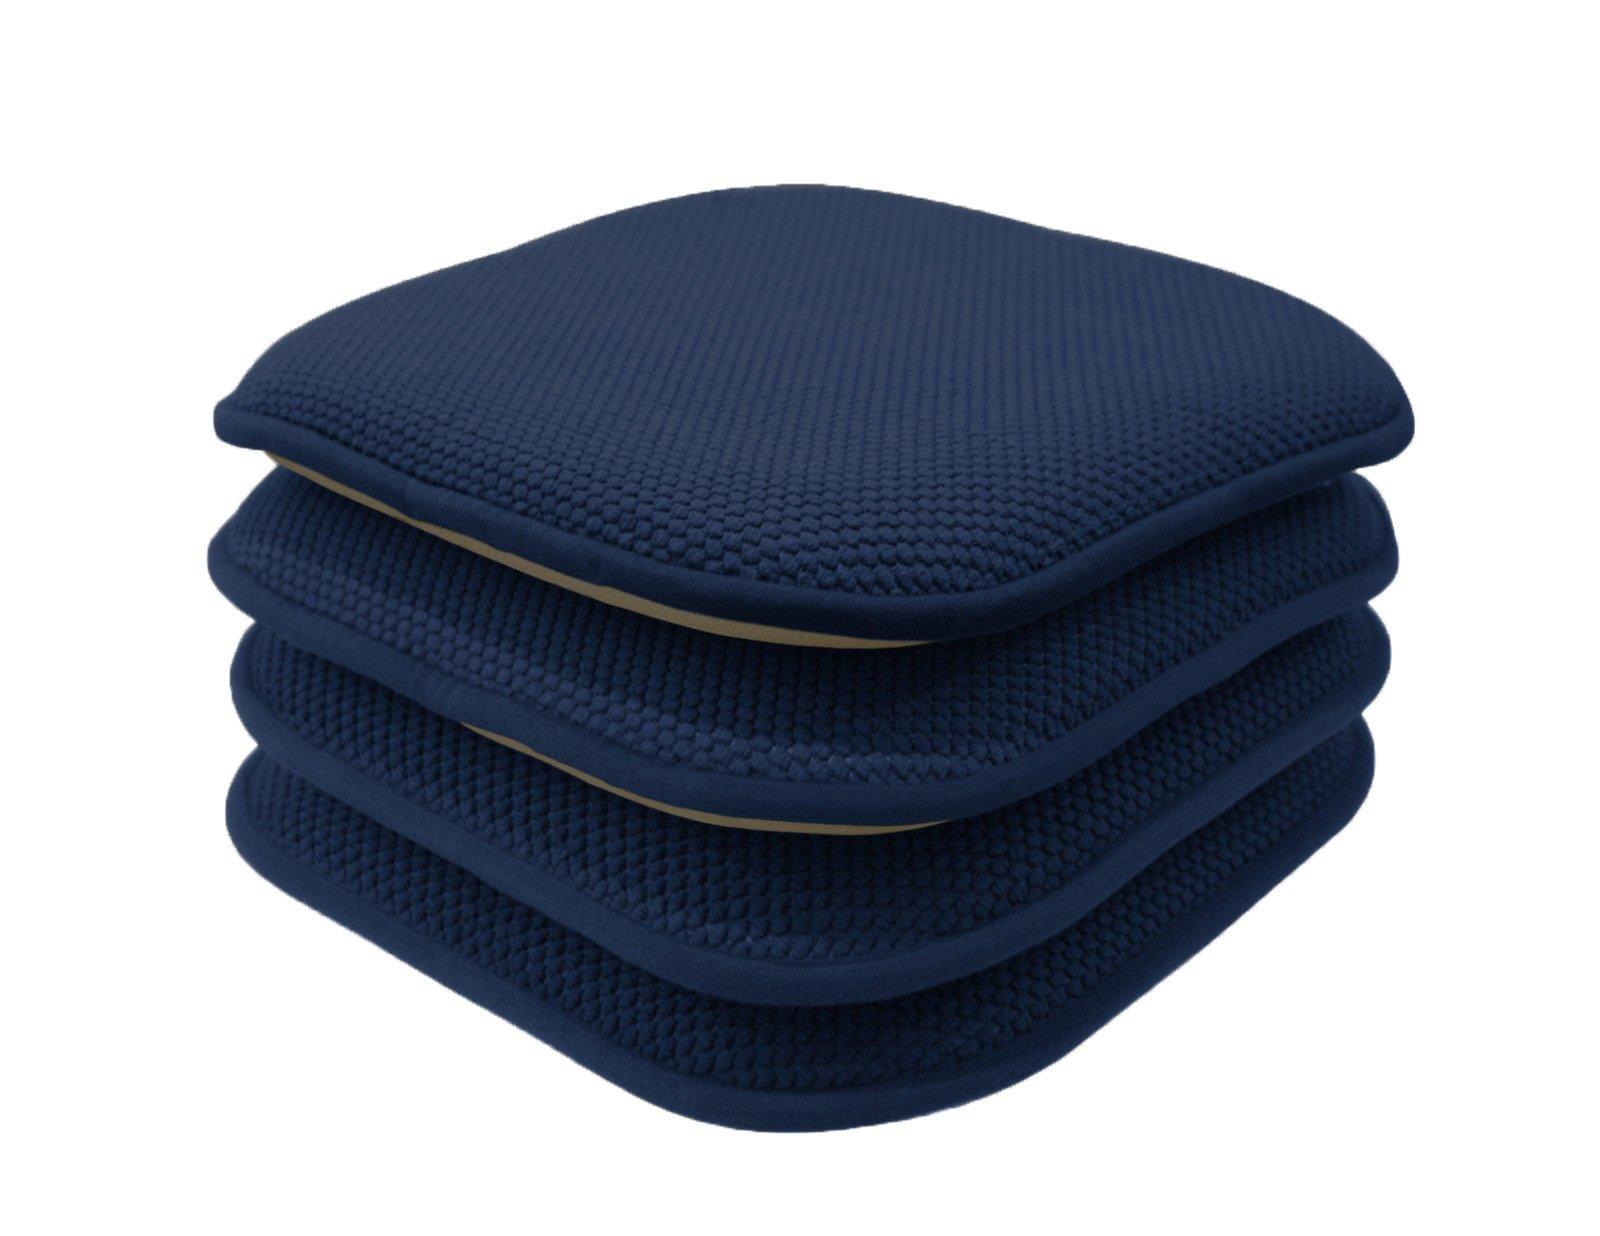 GoodGram 4 Pack Non Slip Honeycomb Premium Comfort Memory Foam Chair Pads/Cushions - Assorted Colors (Navy)